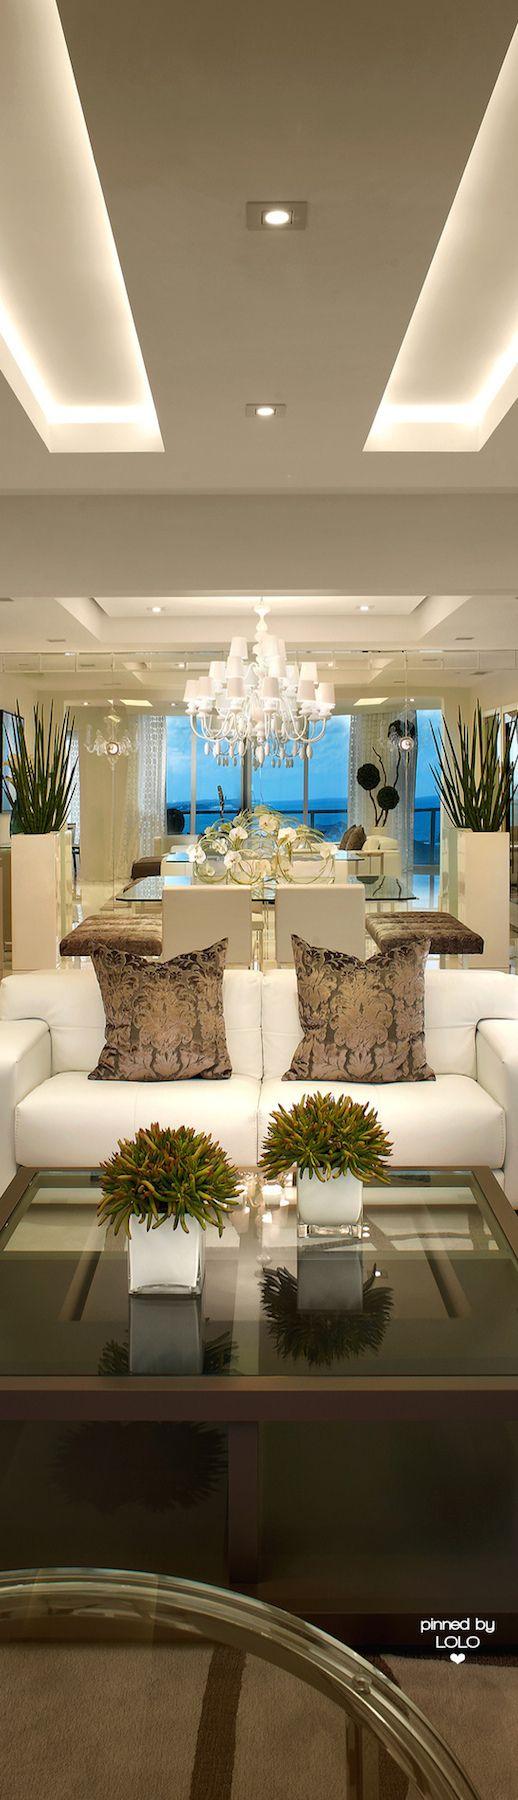 25 Best Ideas About Modern Interiors On Pinterest Modern Interior Minimalist Floor Paint And Interior Design Kitchen